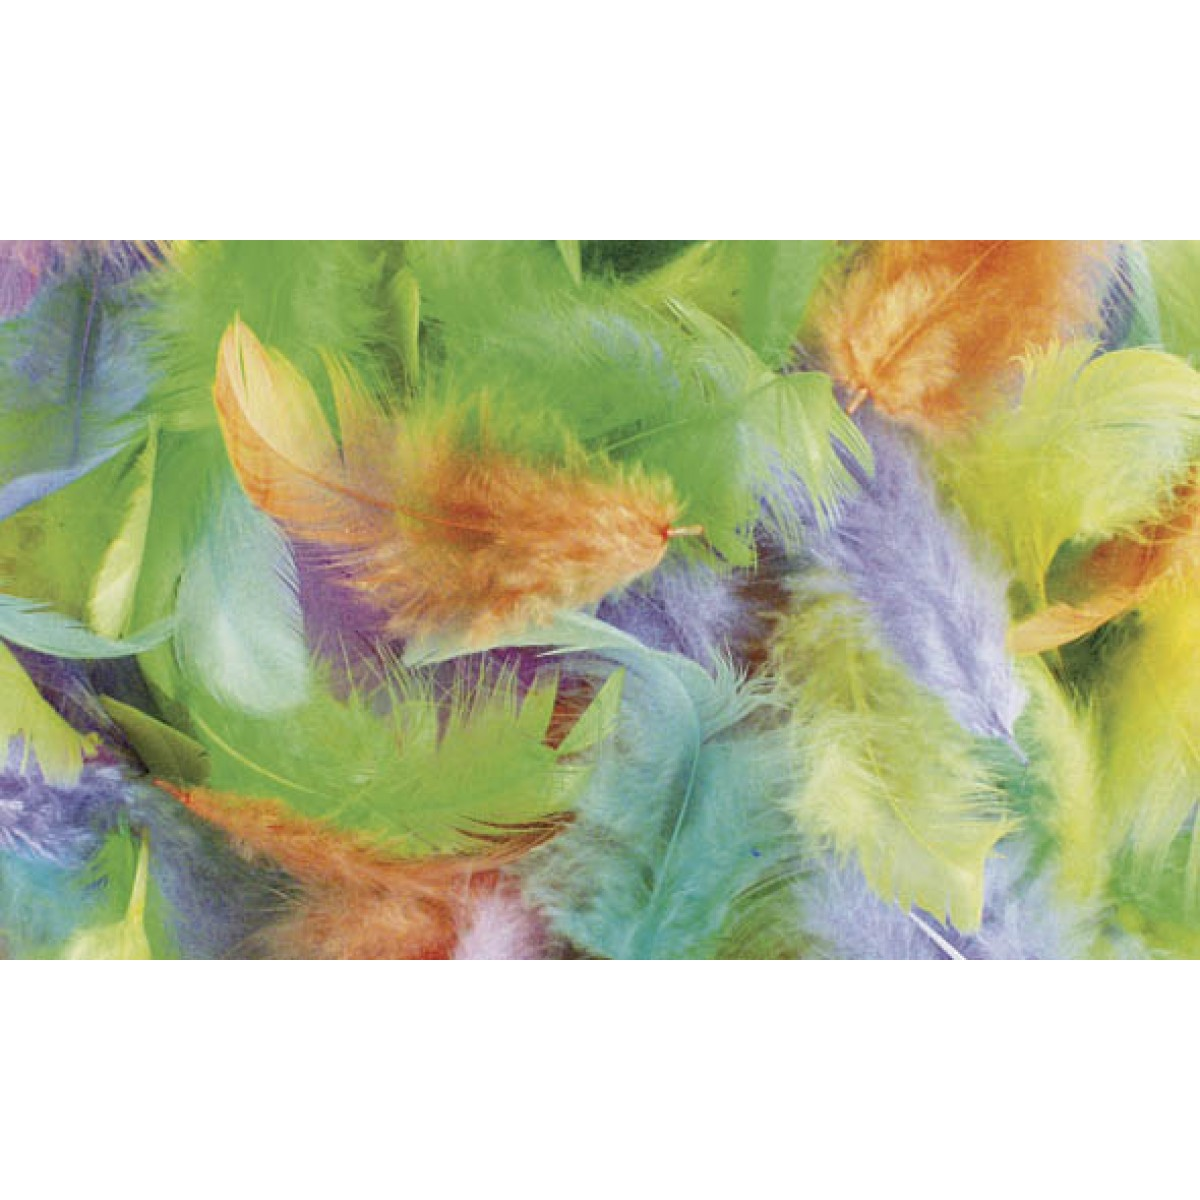 Rayher Πούπουλα Μίξη Παλ Χρώματα 10gr Υλικά Χειροτεχνίας